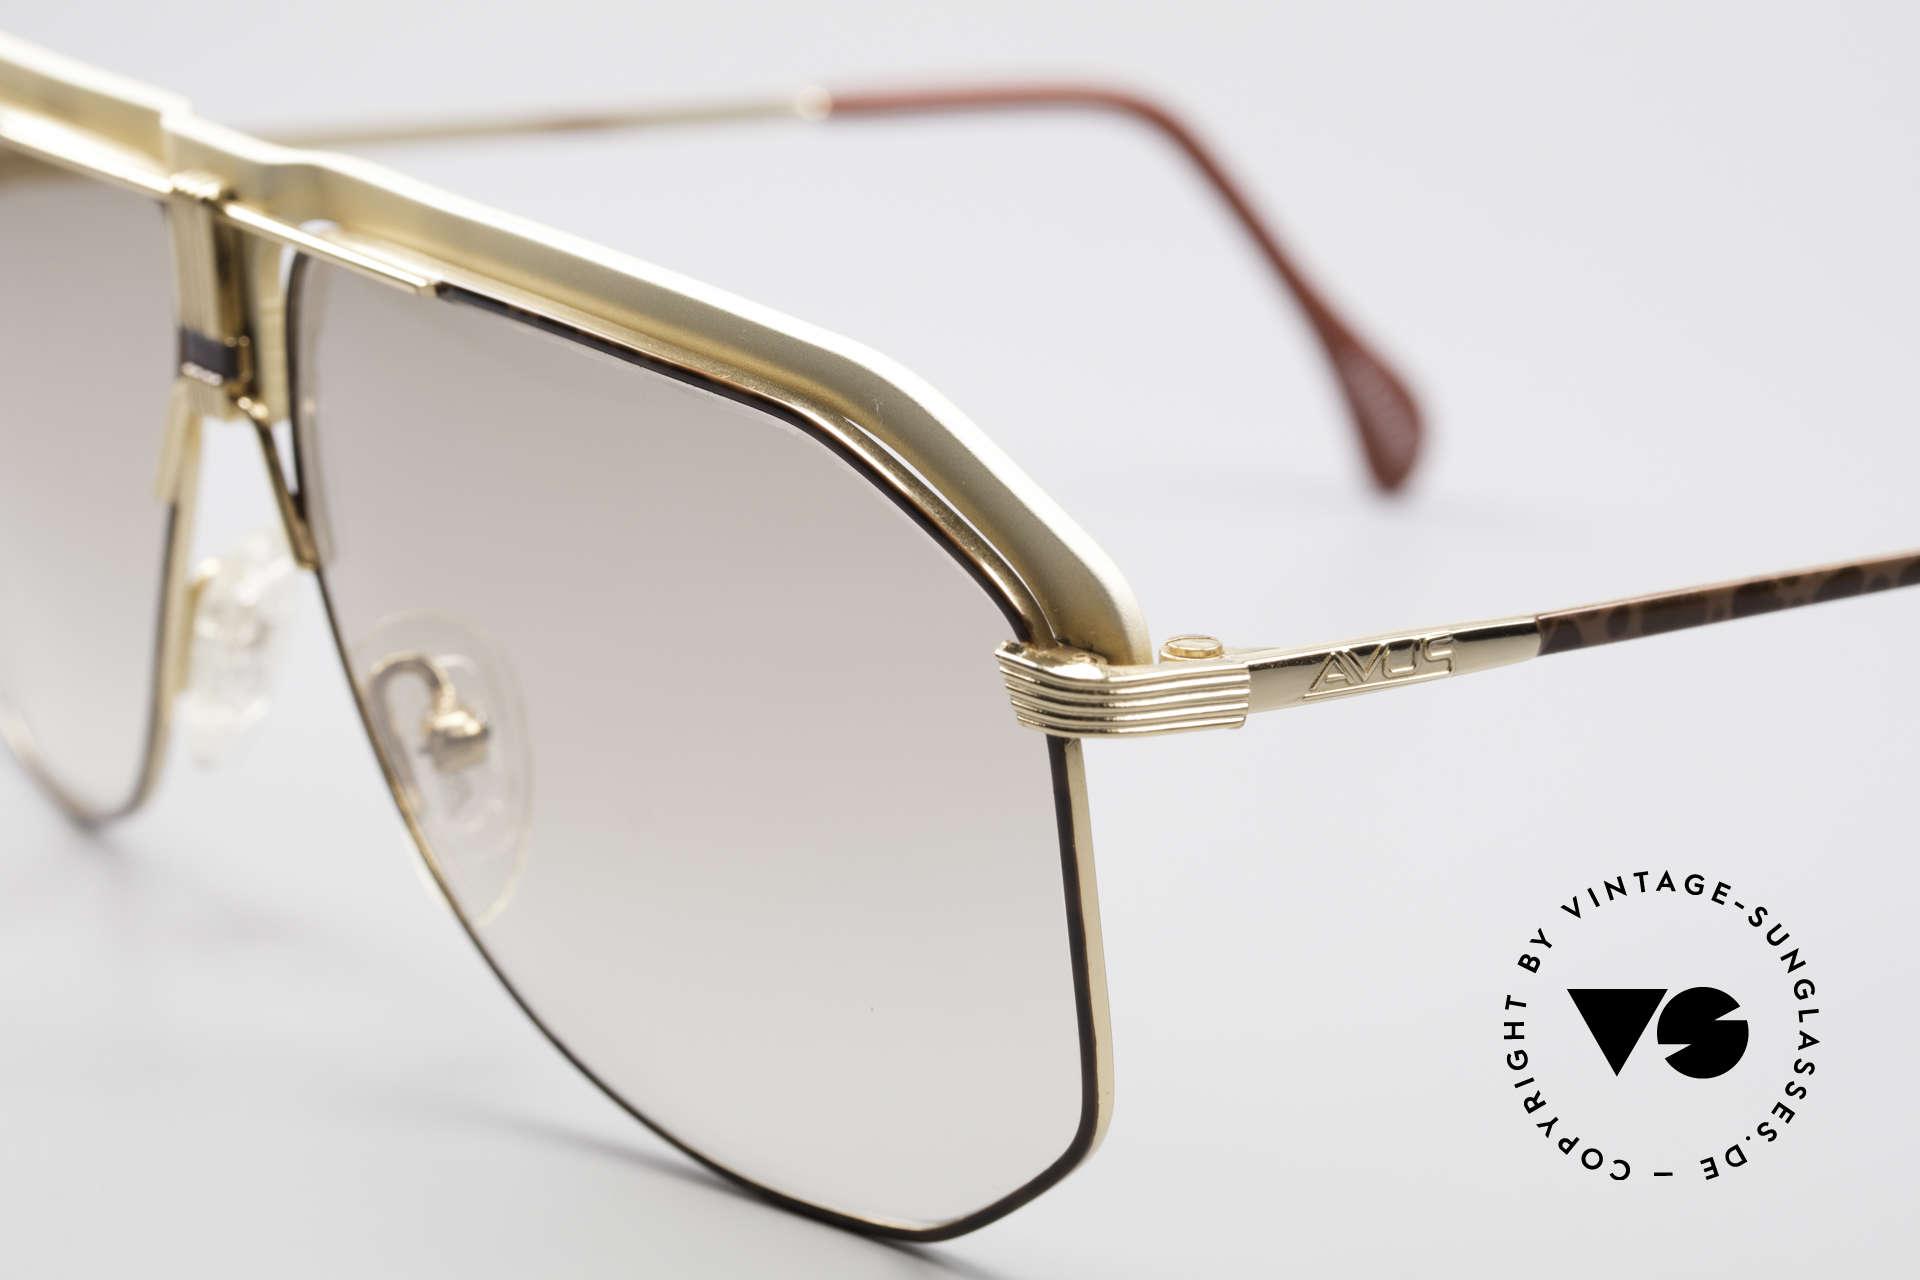 AVUS 2-130 Men's Luxury 80's Shades, outstanding craftsmanship (handmade W. Germany), Made for Men